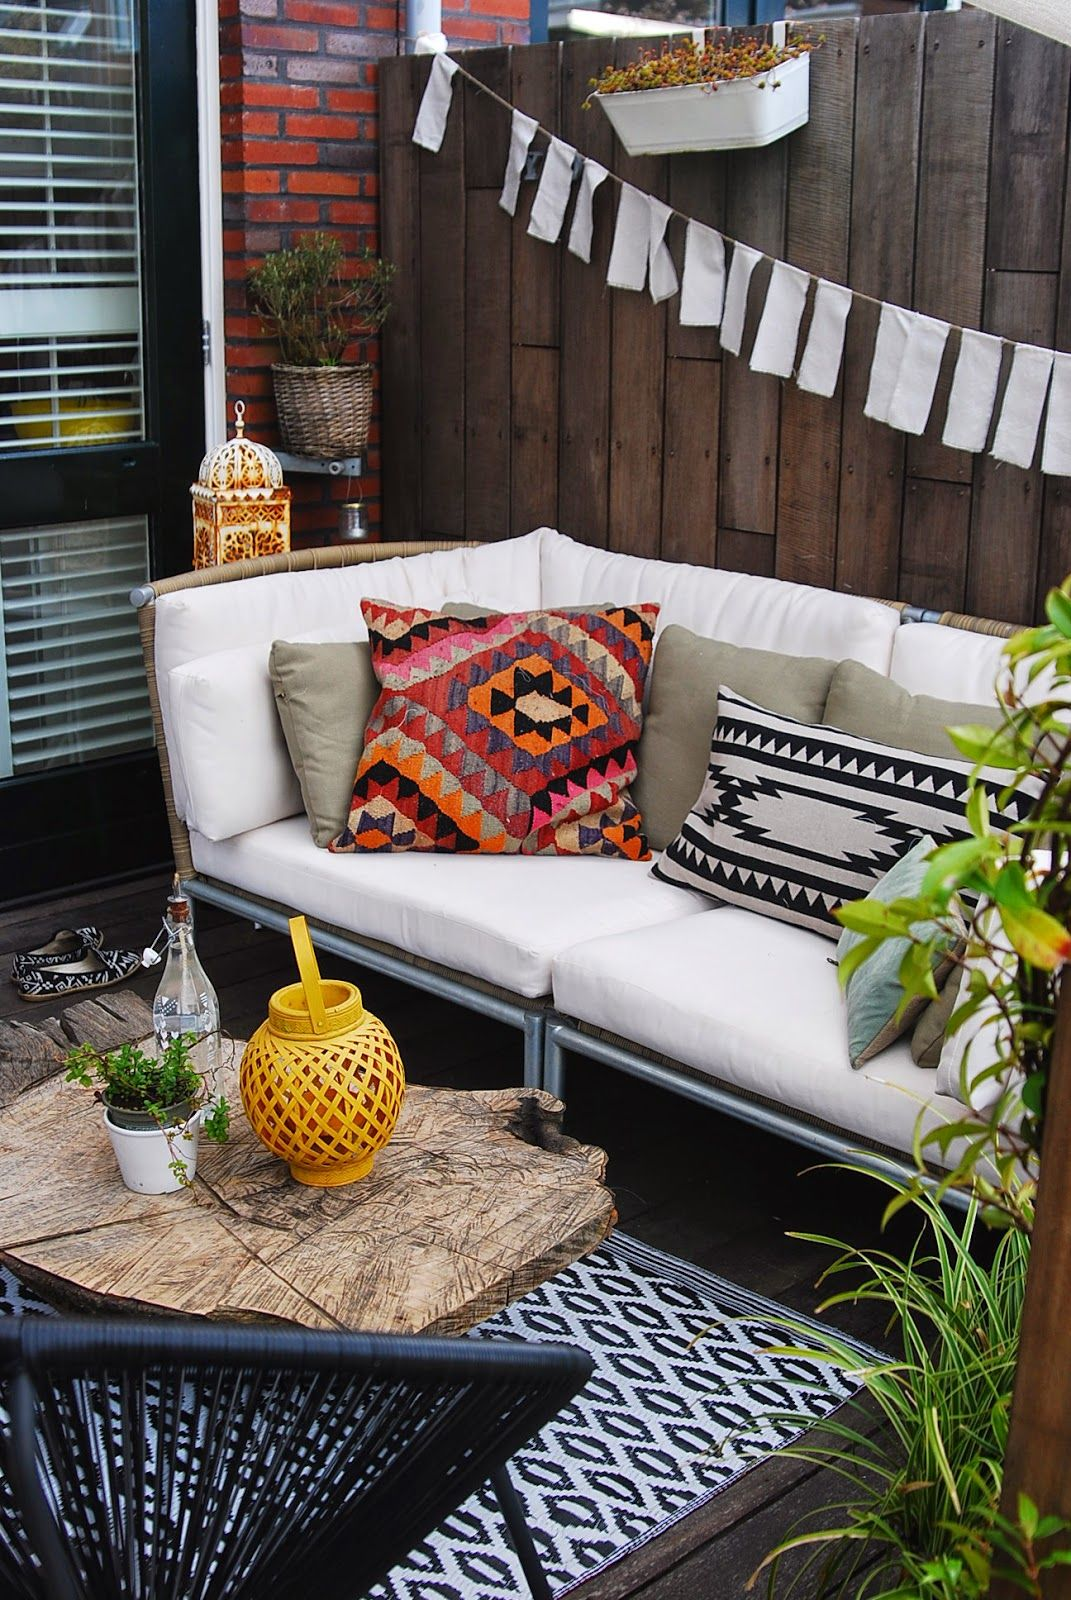 bohemien rustic terras aestheticyou je t 39 outdoor living pinterest balkon. Black Bedroom Furniture Sets. Home Design Ideas